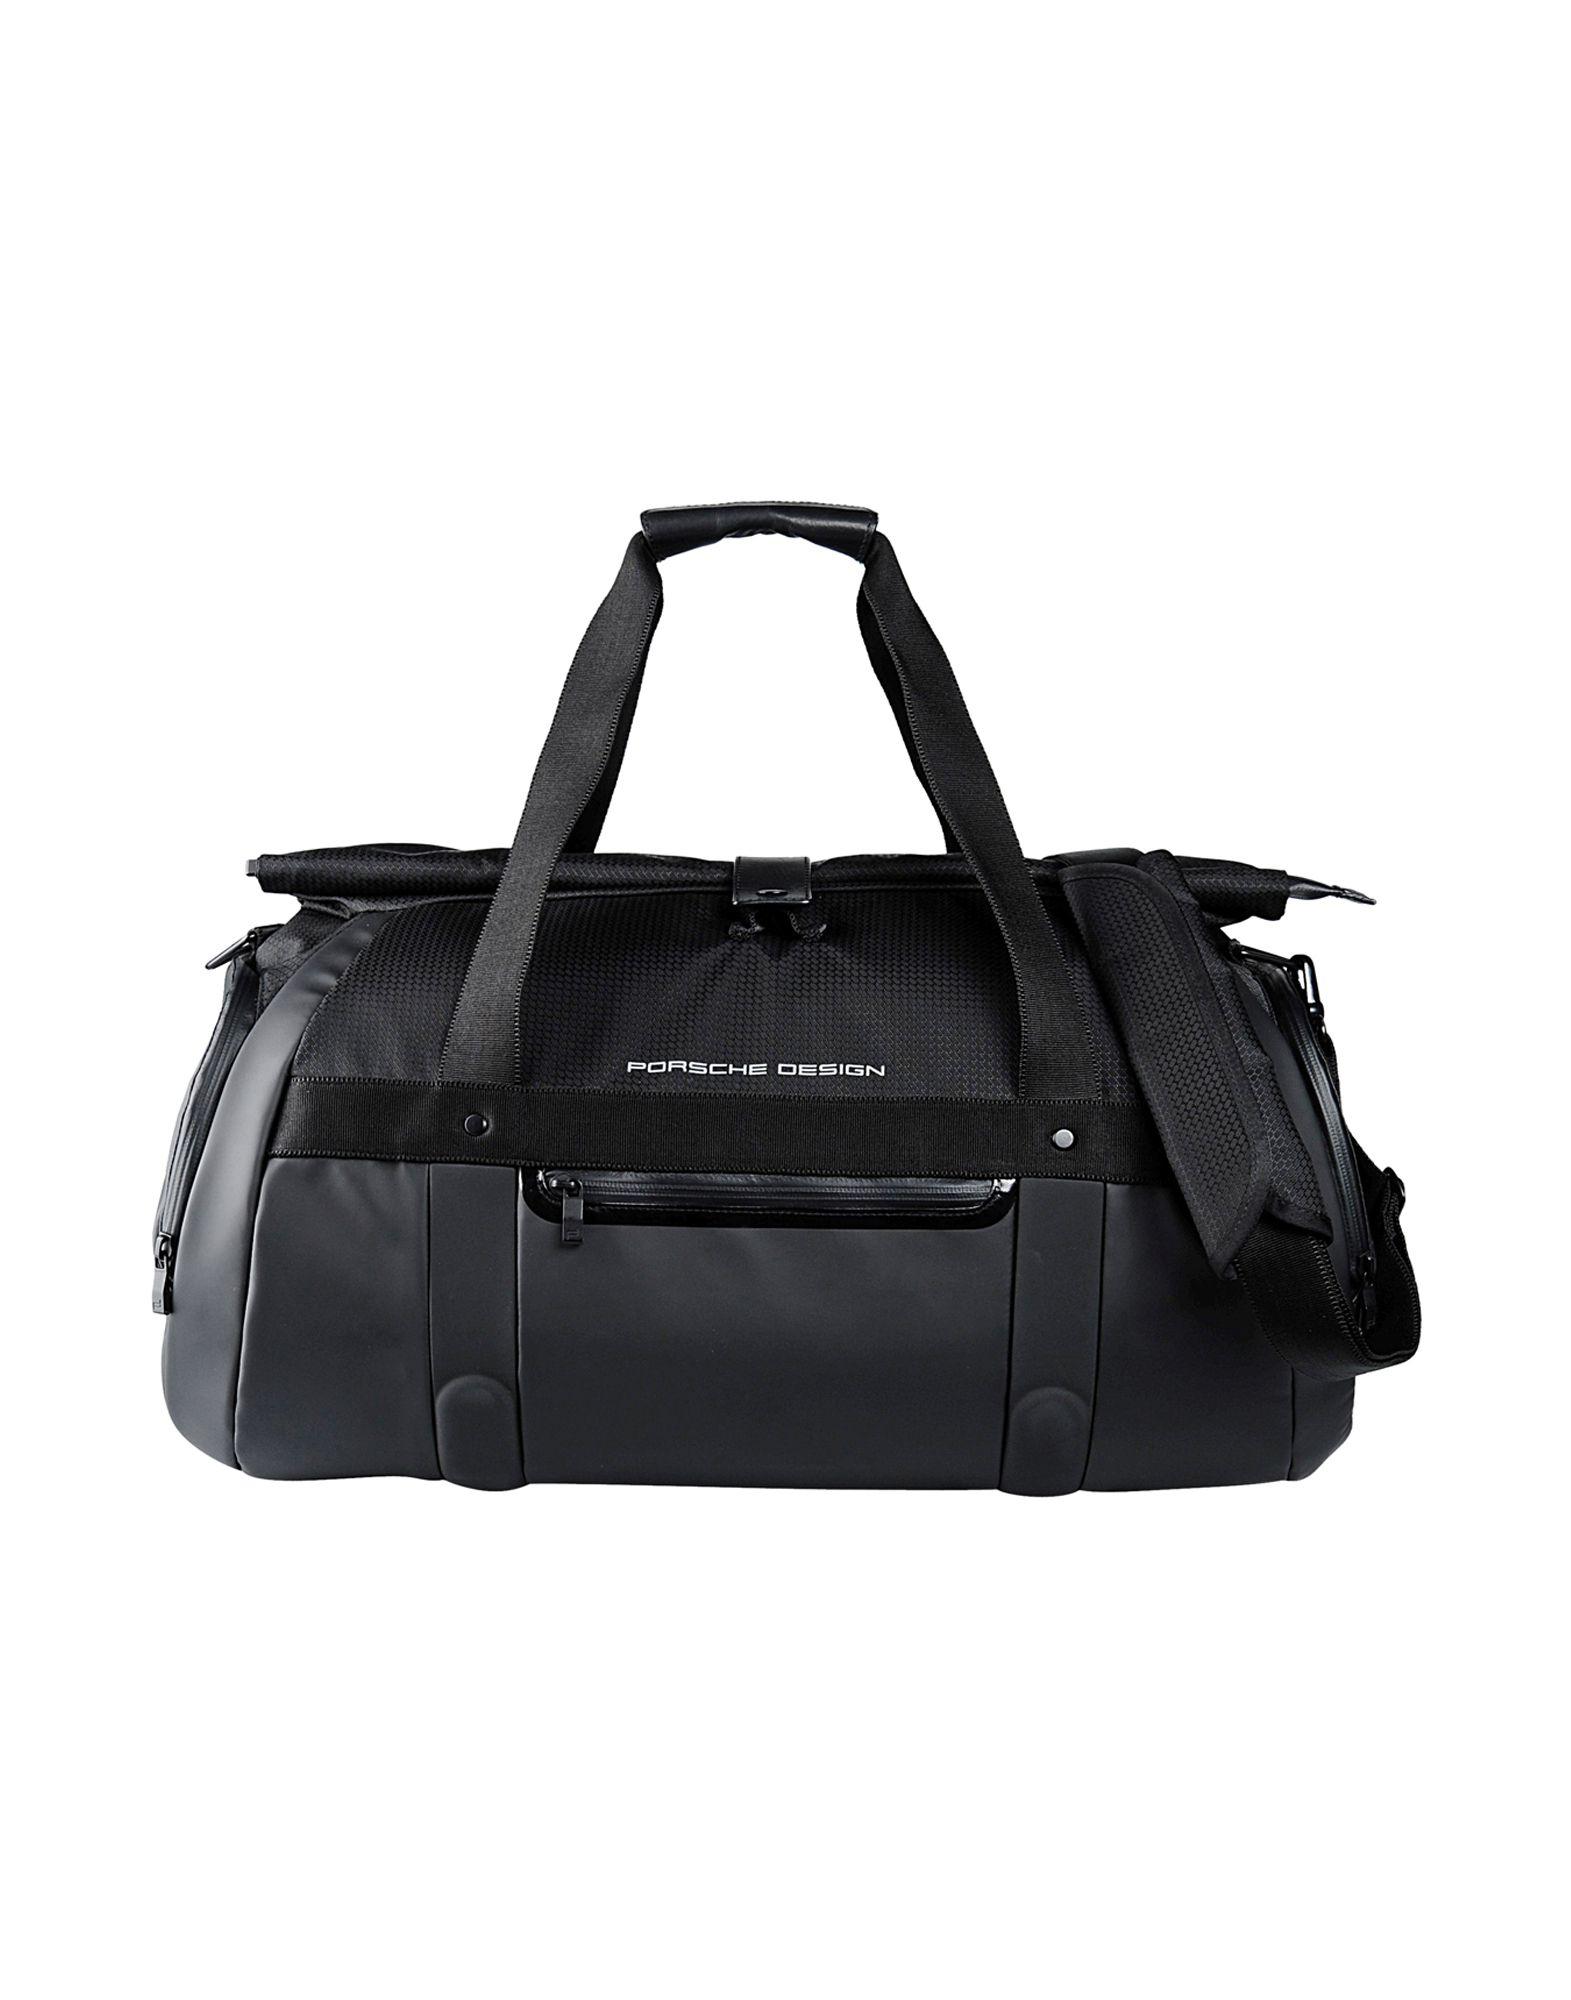 60fdb730300b new arrivals porsche design sport adidas bs teambag backpack 11 30f7b  98f14  best price lyst porsche design travel duffel bag in black for men  cf3da fdd62